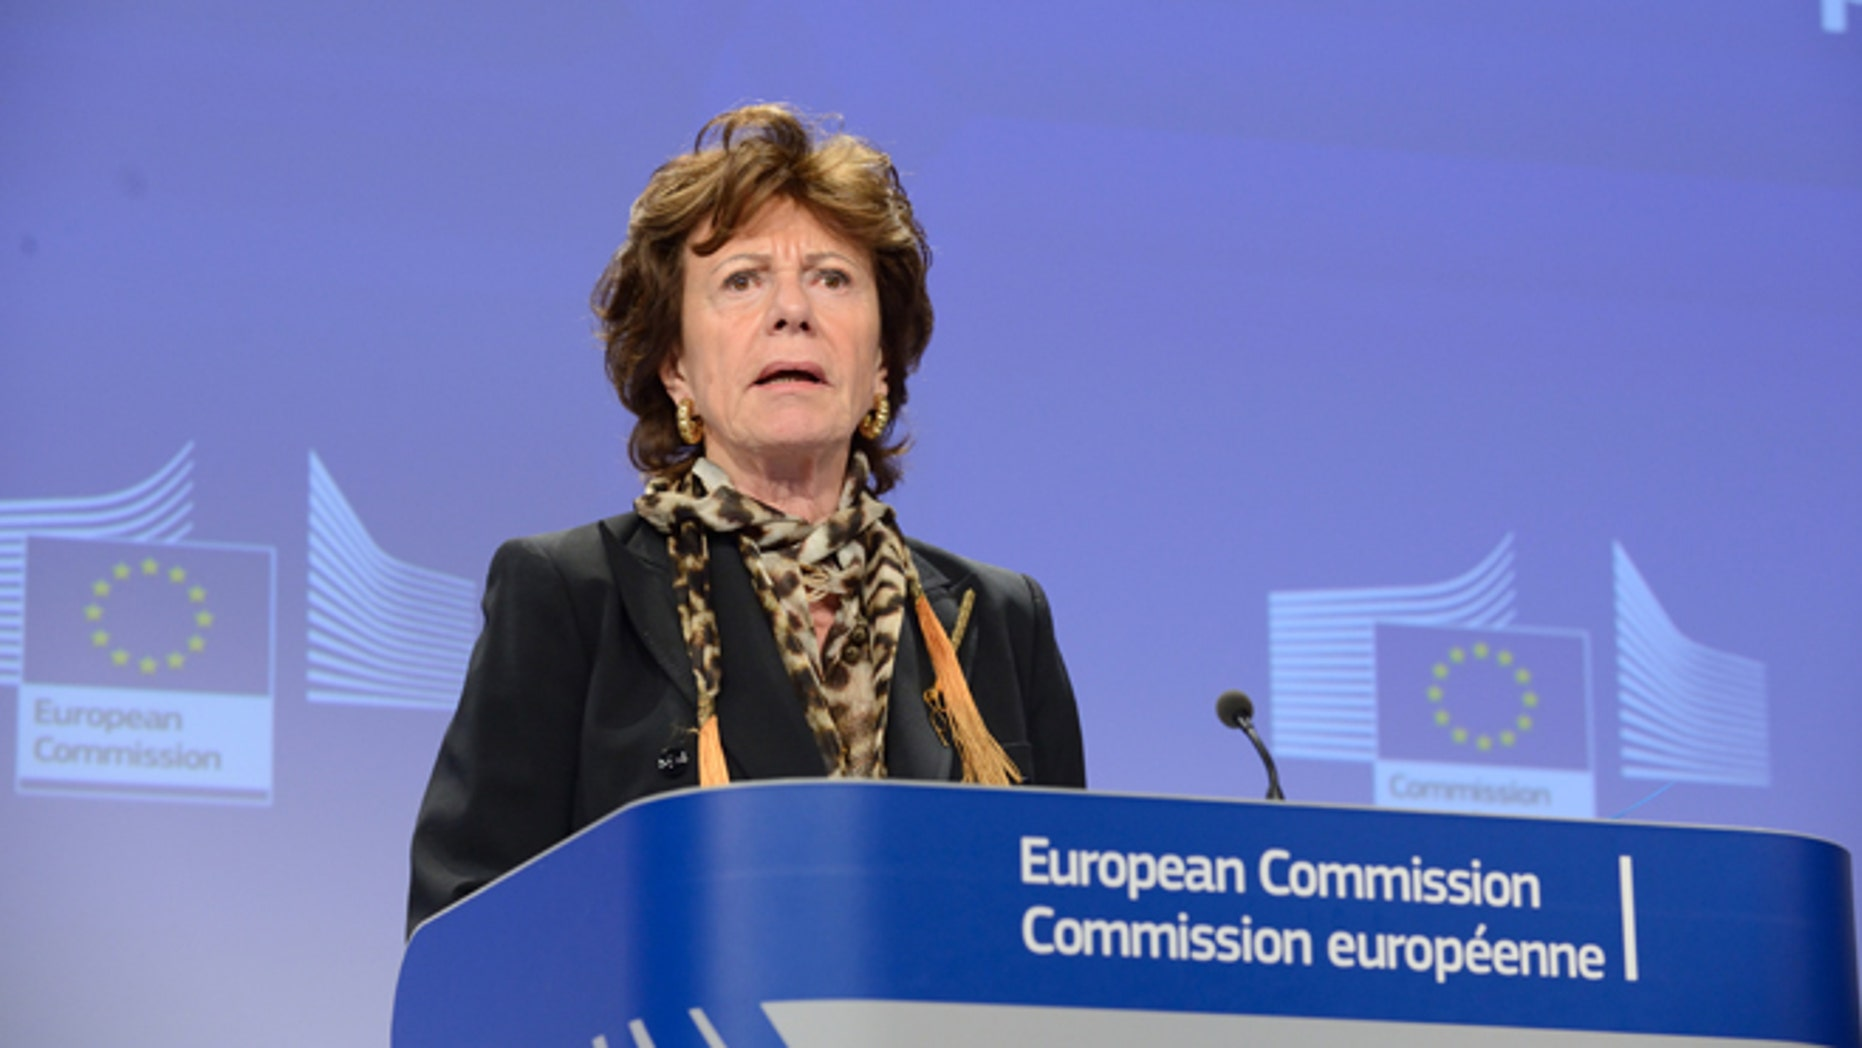 Feb. 12, 2014: Neelie Kroes, vice-president of digital agenda for the European Commission, speaks at a press conference on Internet Governance.